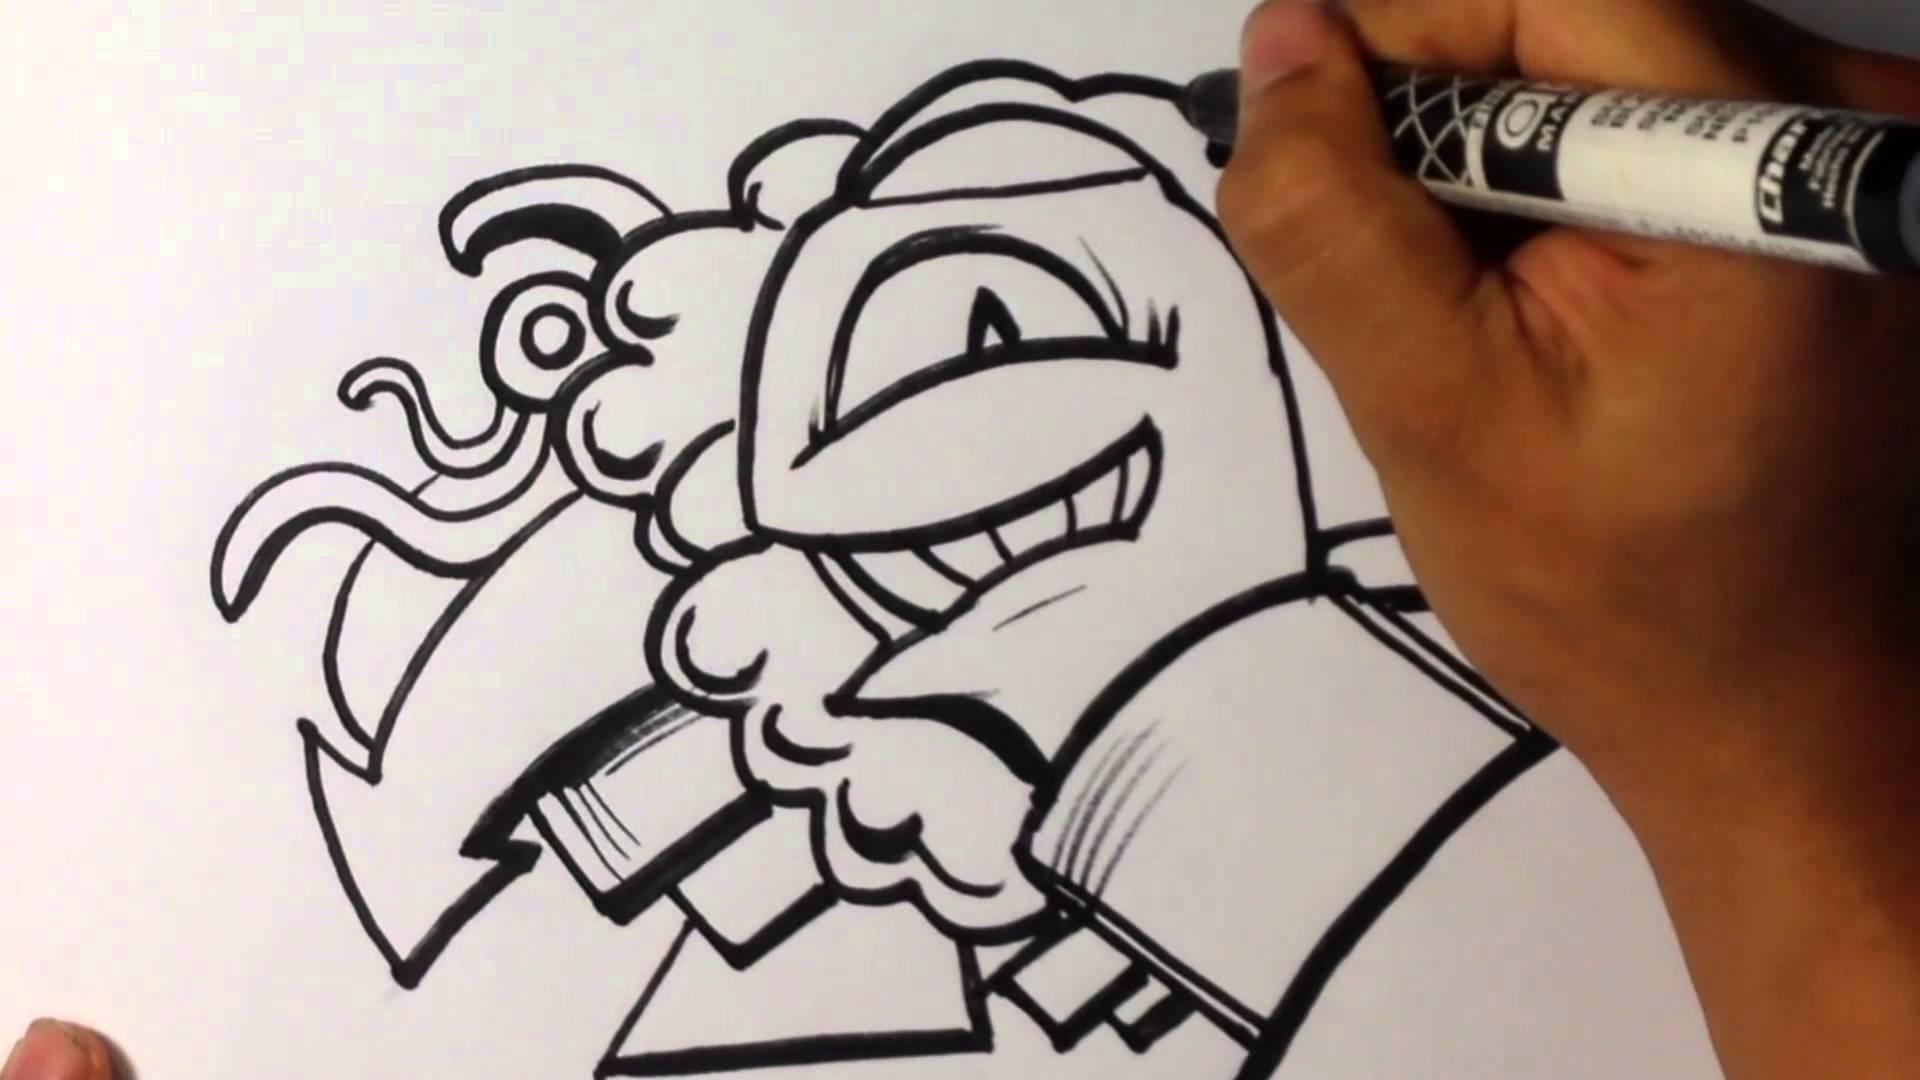 Drawn randome graffiti Draw Pictures Draw Drawing to